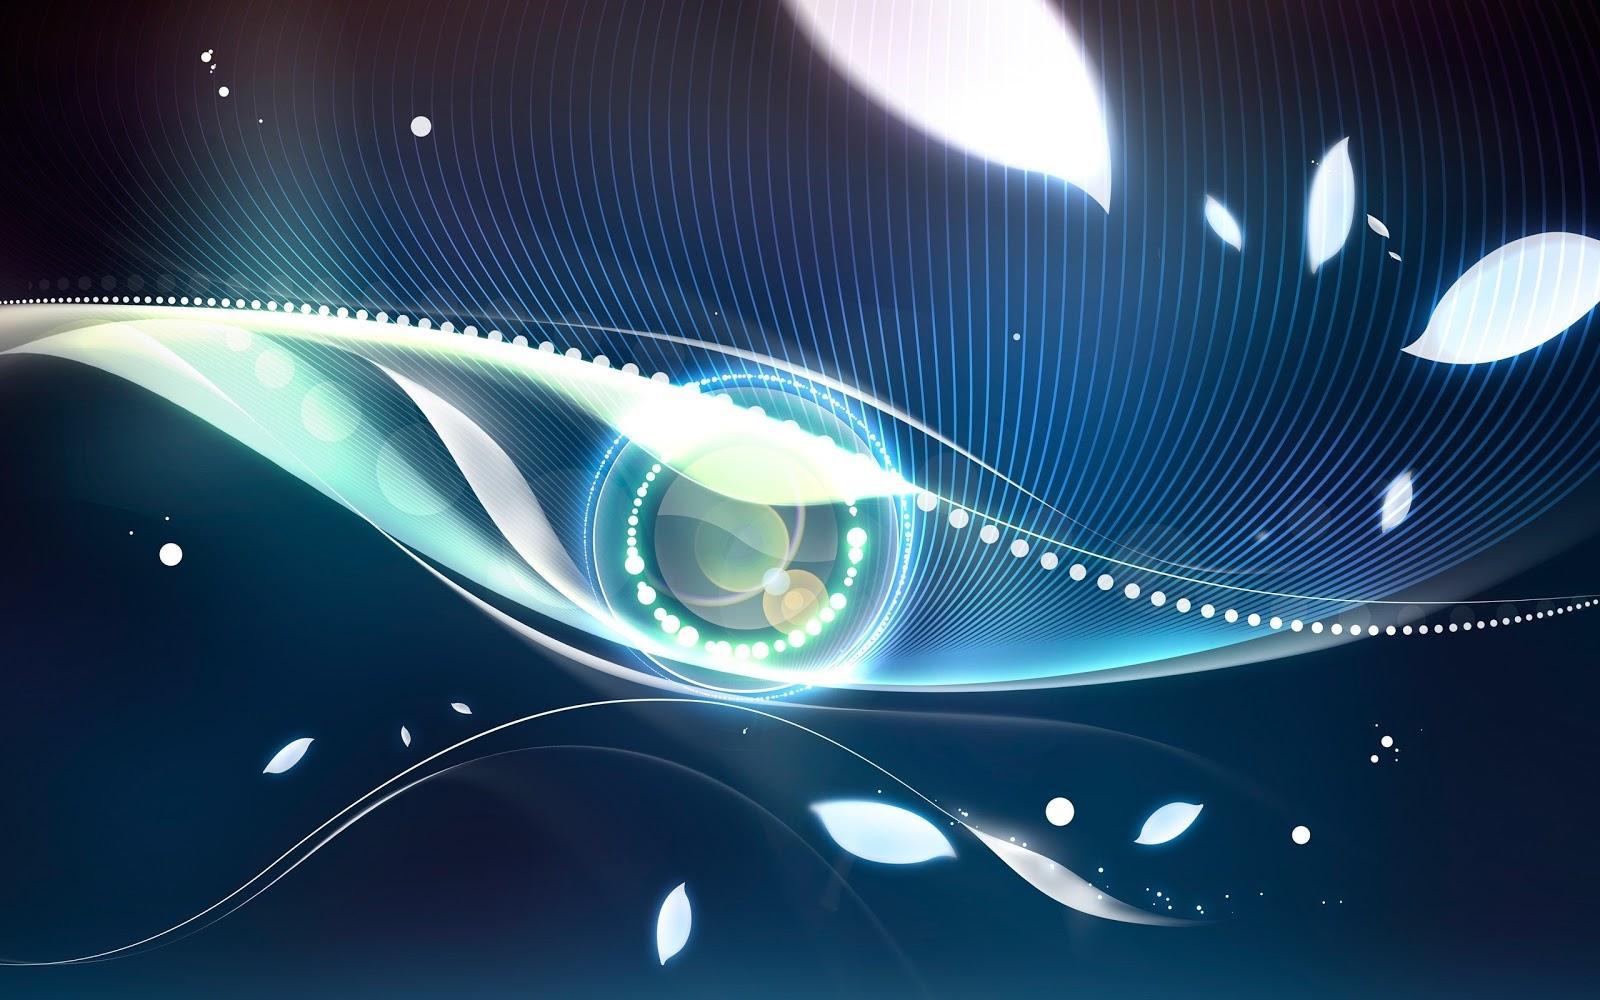 http://2.bp.blogspot.com/-XBZ2E8HUvYI/T416HPyYxII/AAAAAAAADME/u_mYe4G5I3A/s1600/windows-8-wallpaper-abstract-blue-eyes-2560x1600.jpg